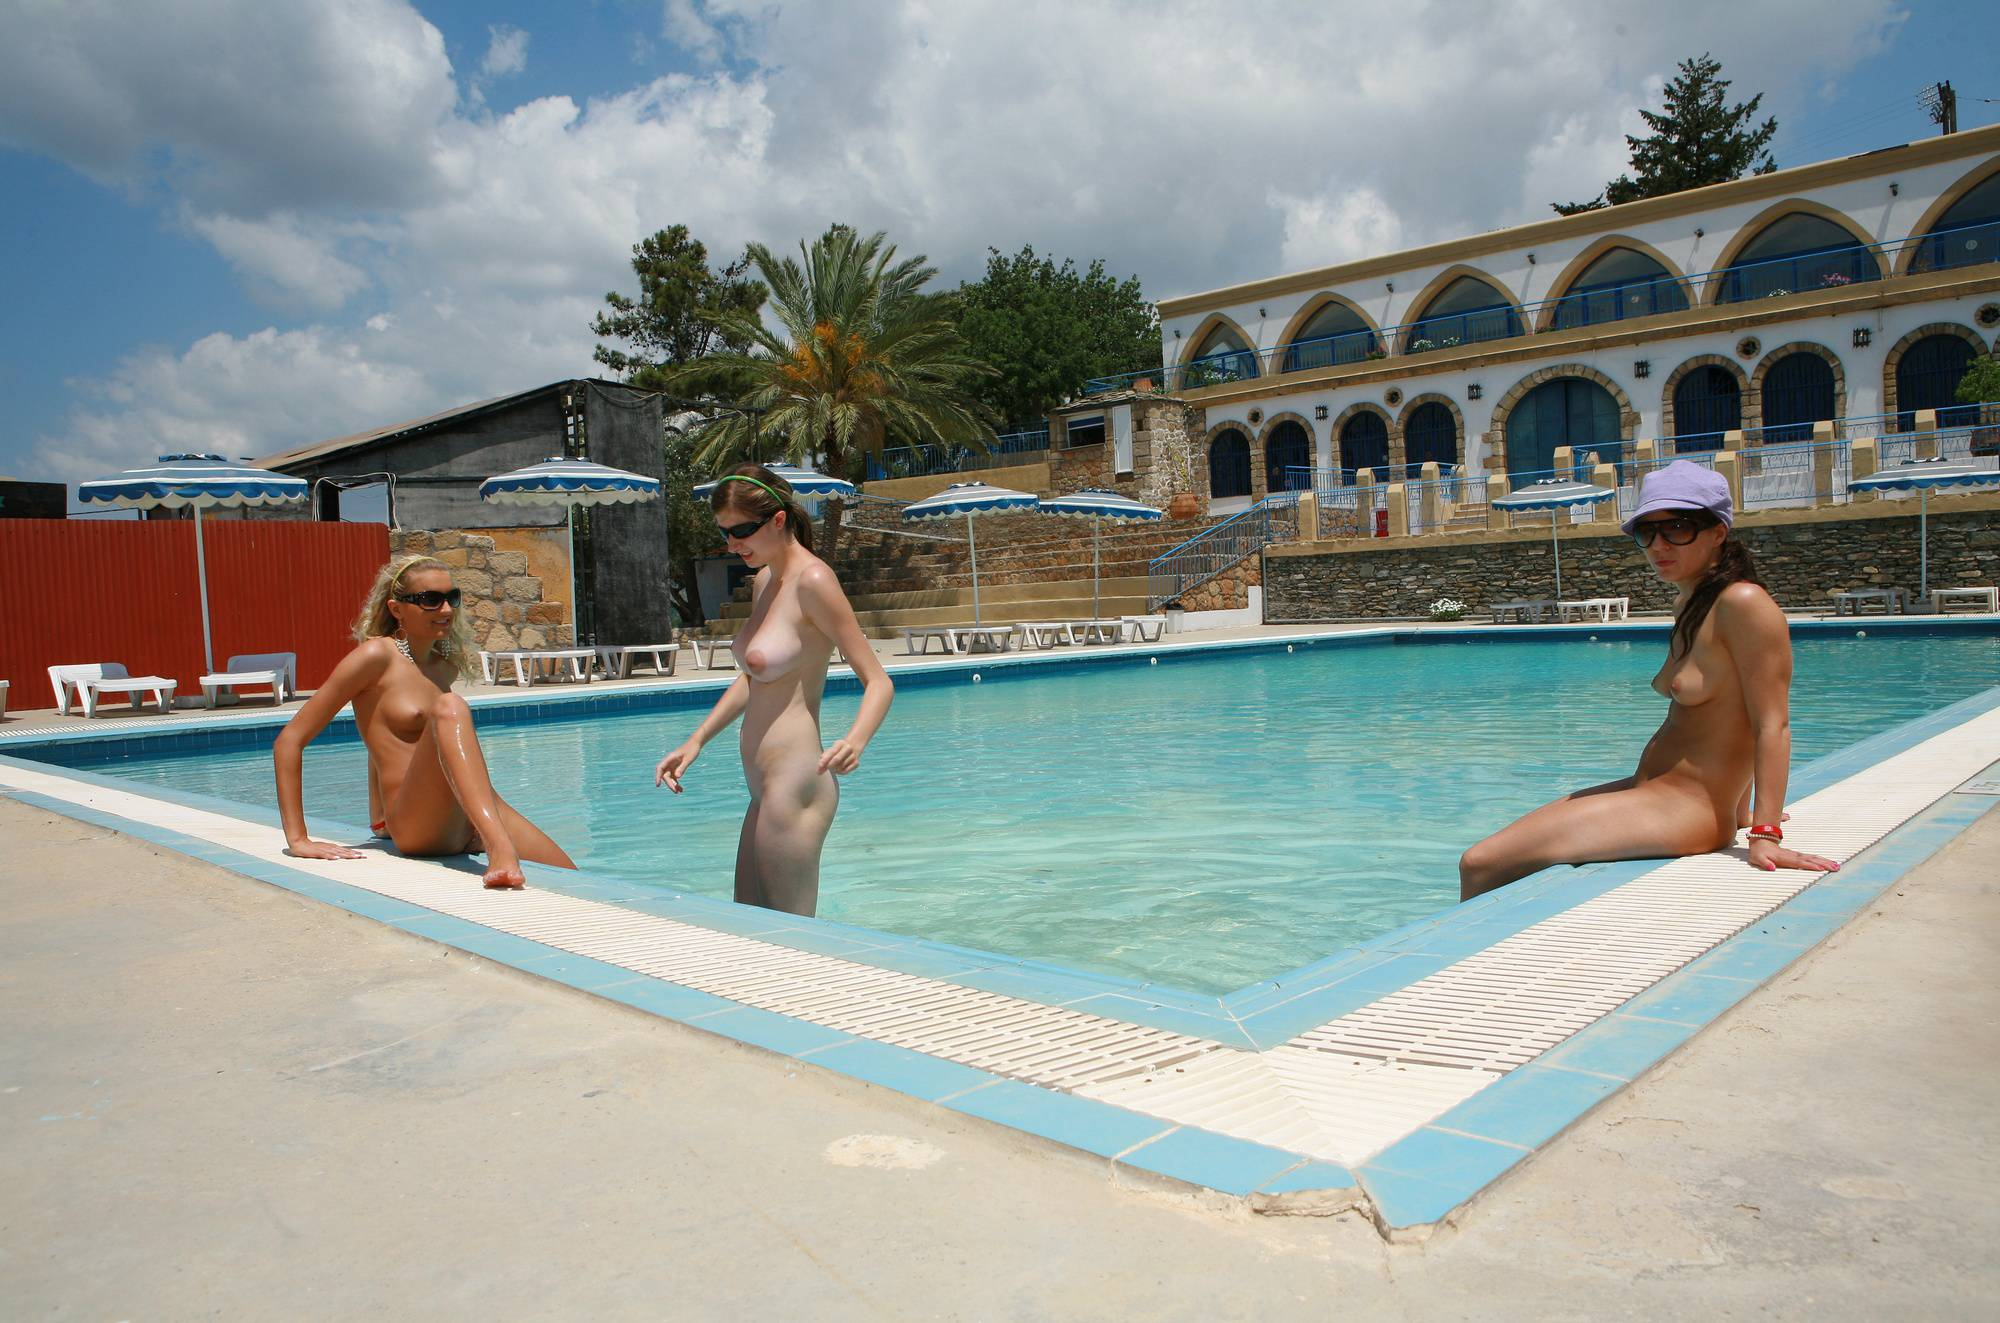 Greek Poolside Lounging - 1